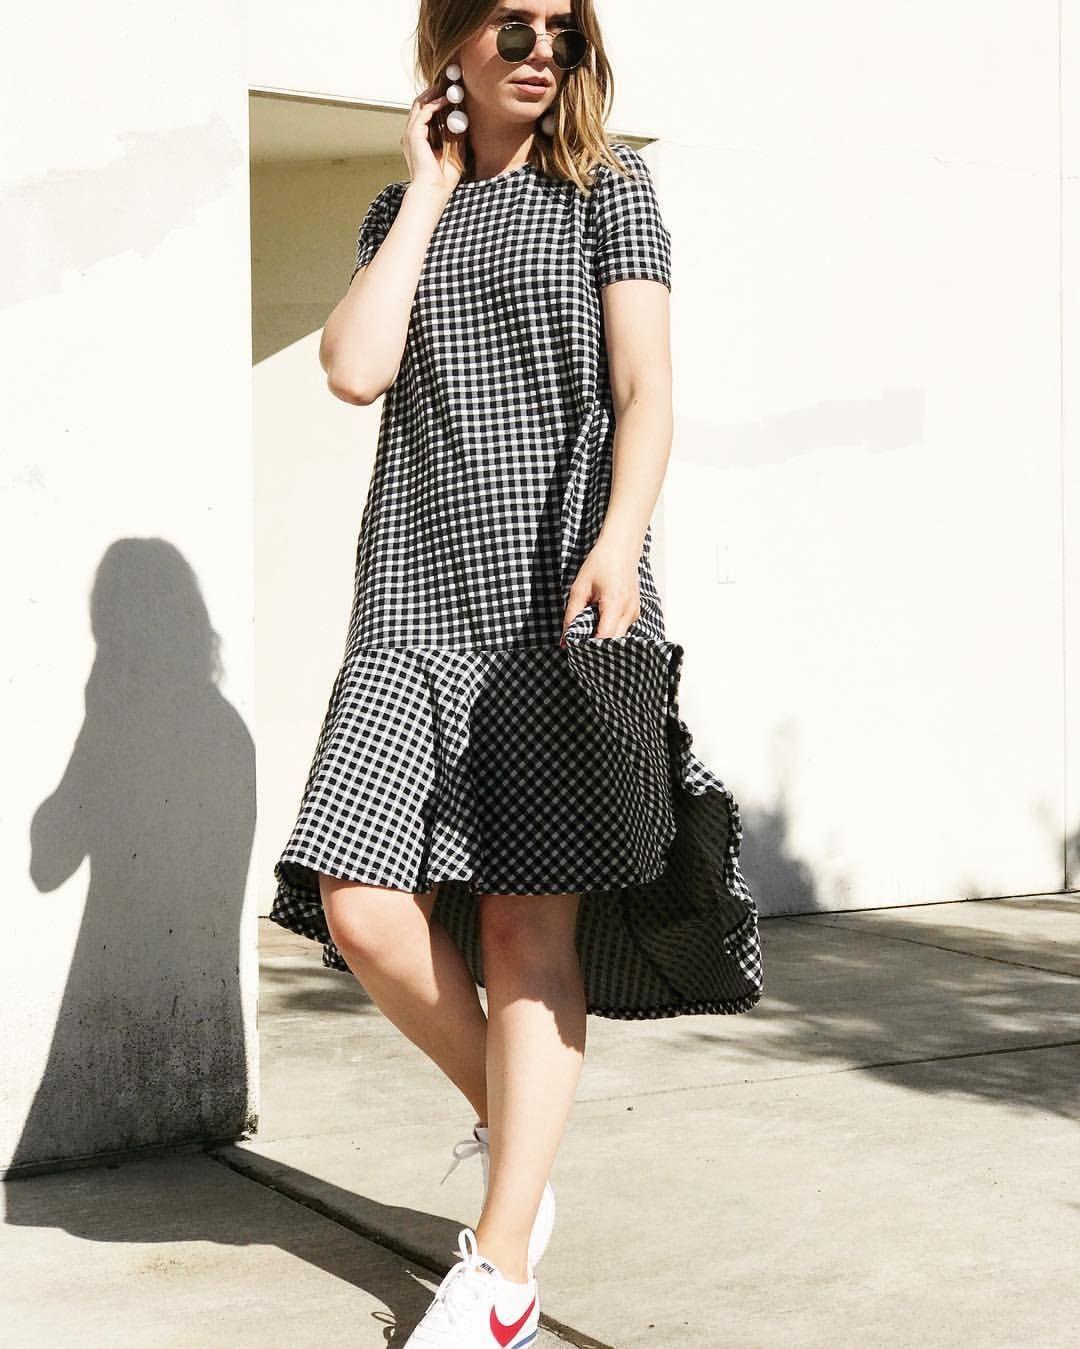 #thegirlishtomboy #outfit #style #streetstyle #fashion #sneakers #nike #nikecortez #gingham